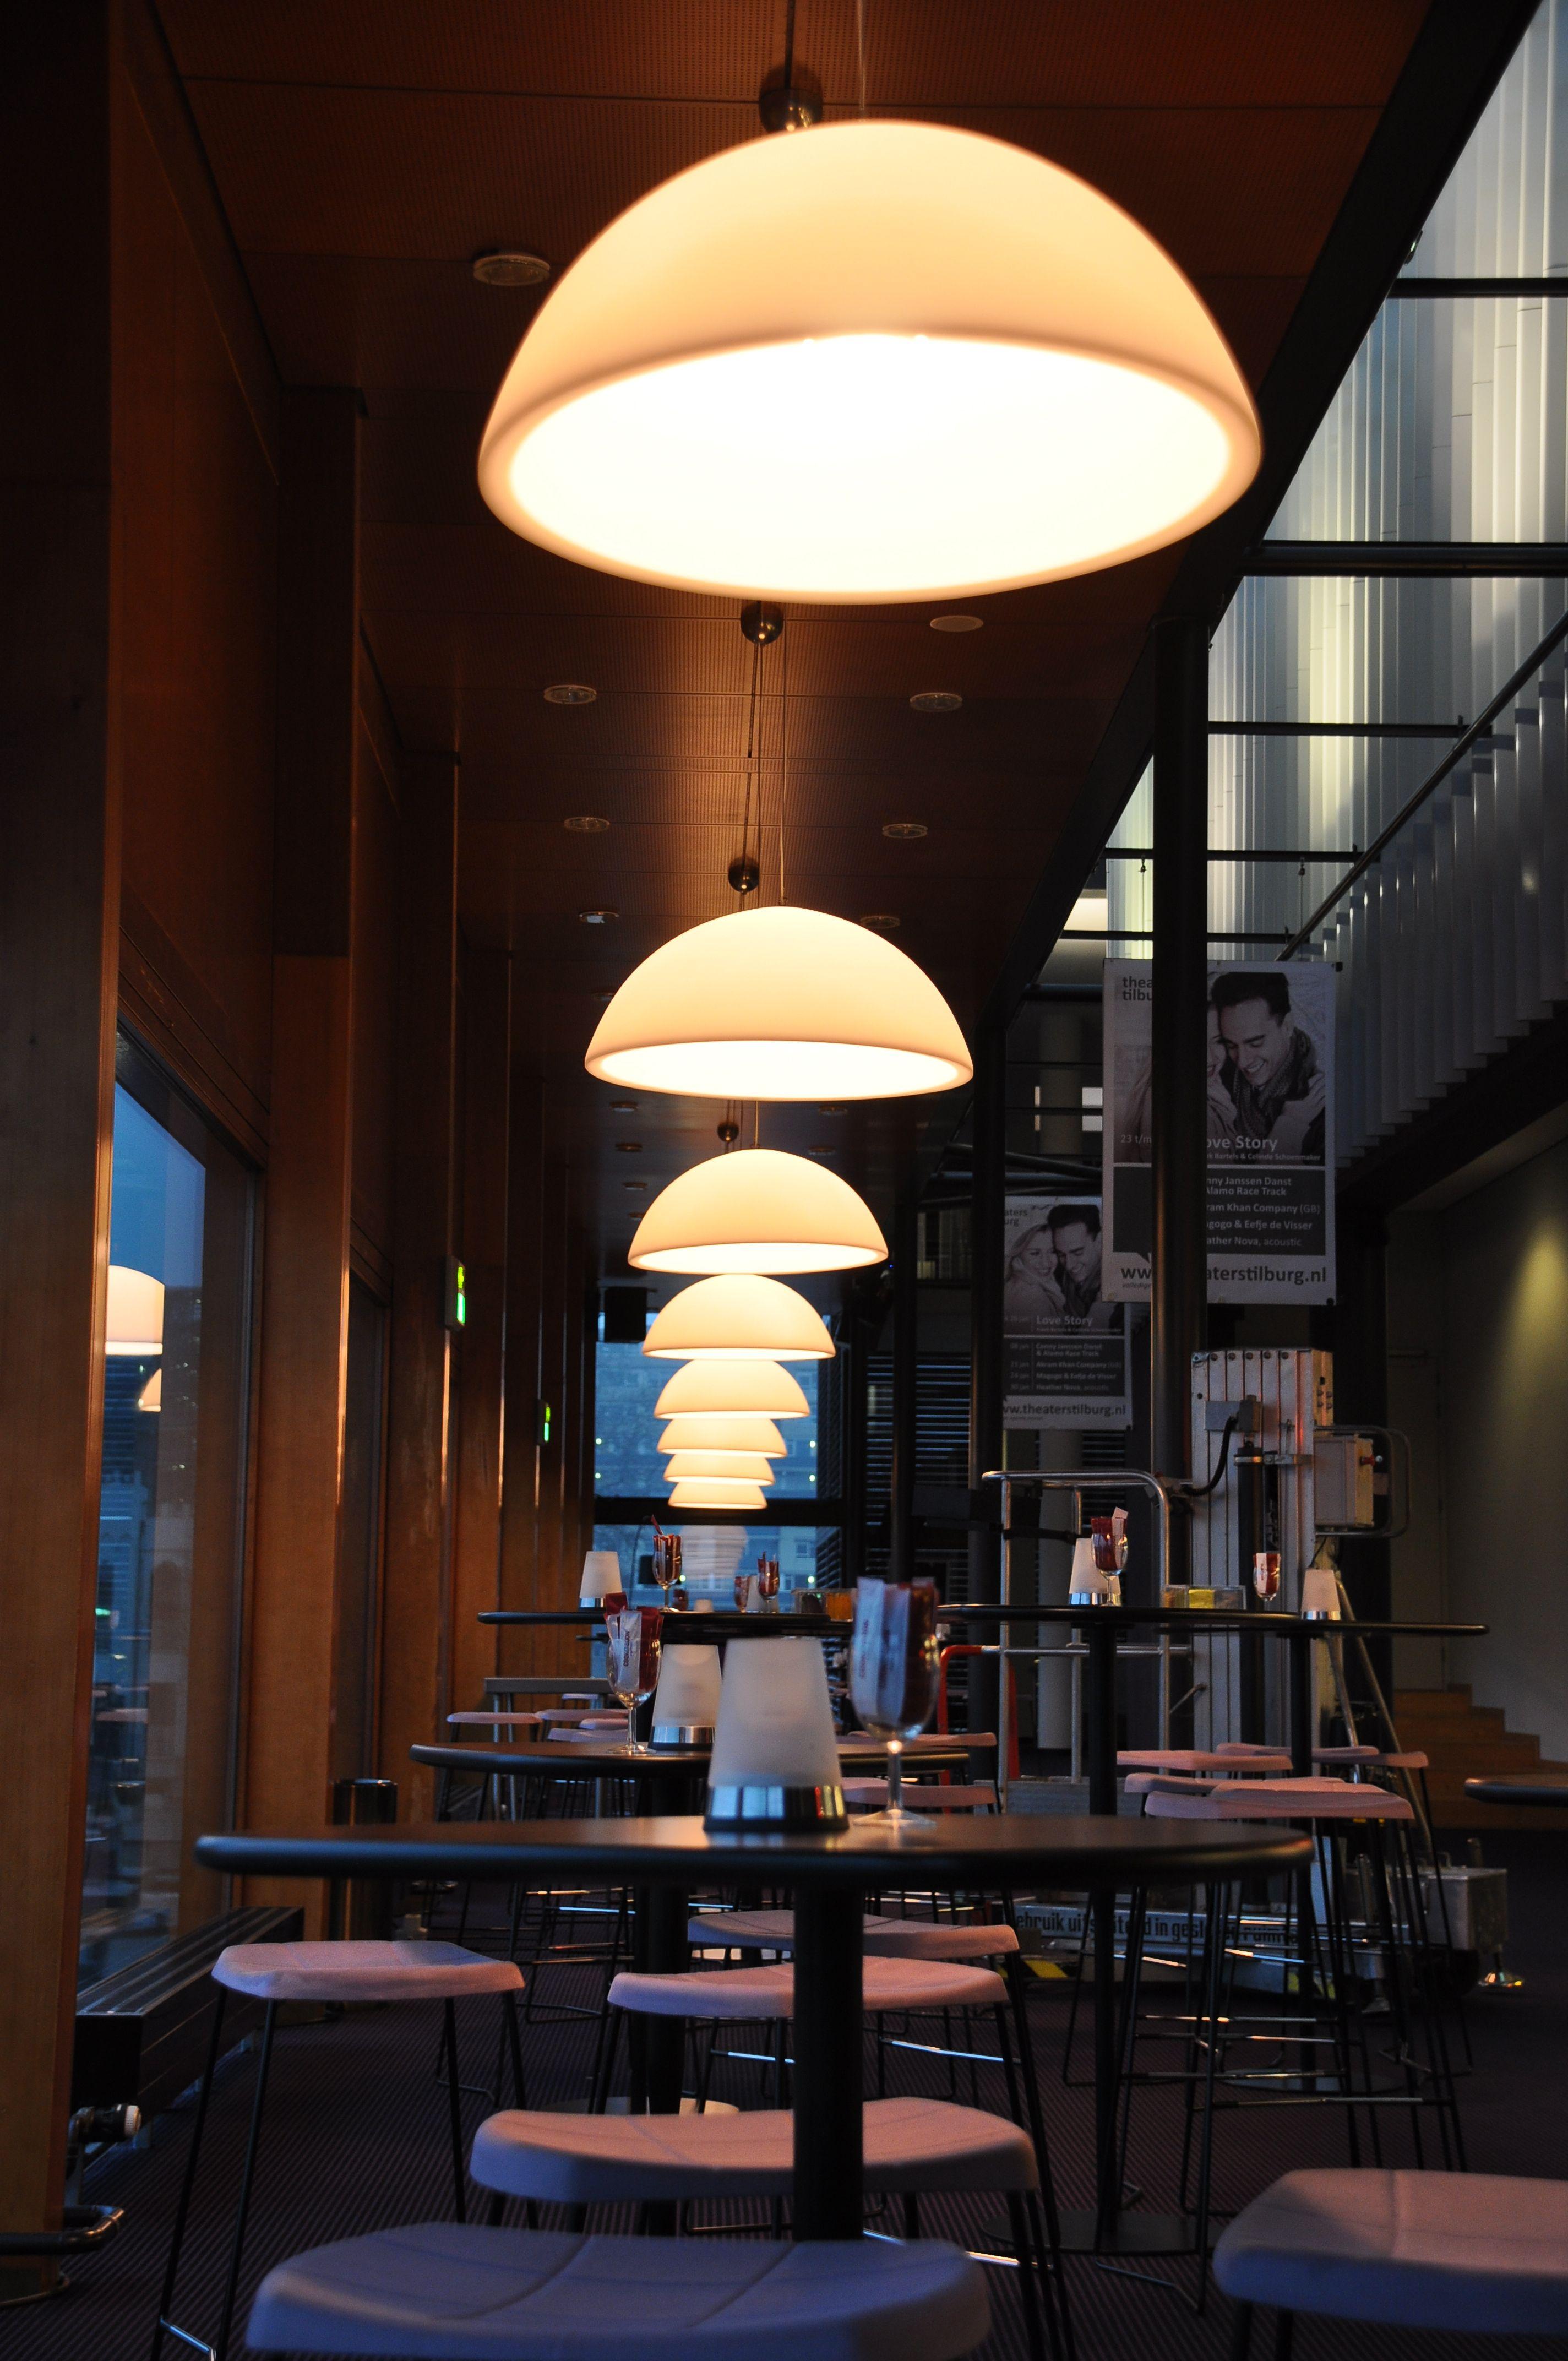 kayradome in de lounge van theater tilburg theaterlight sfeerlicht kayradome verlichting